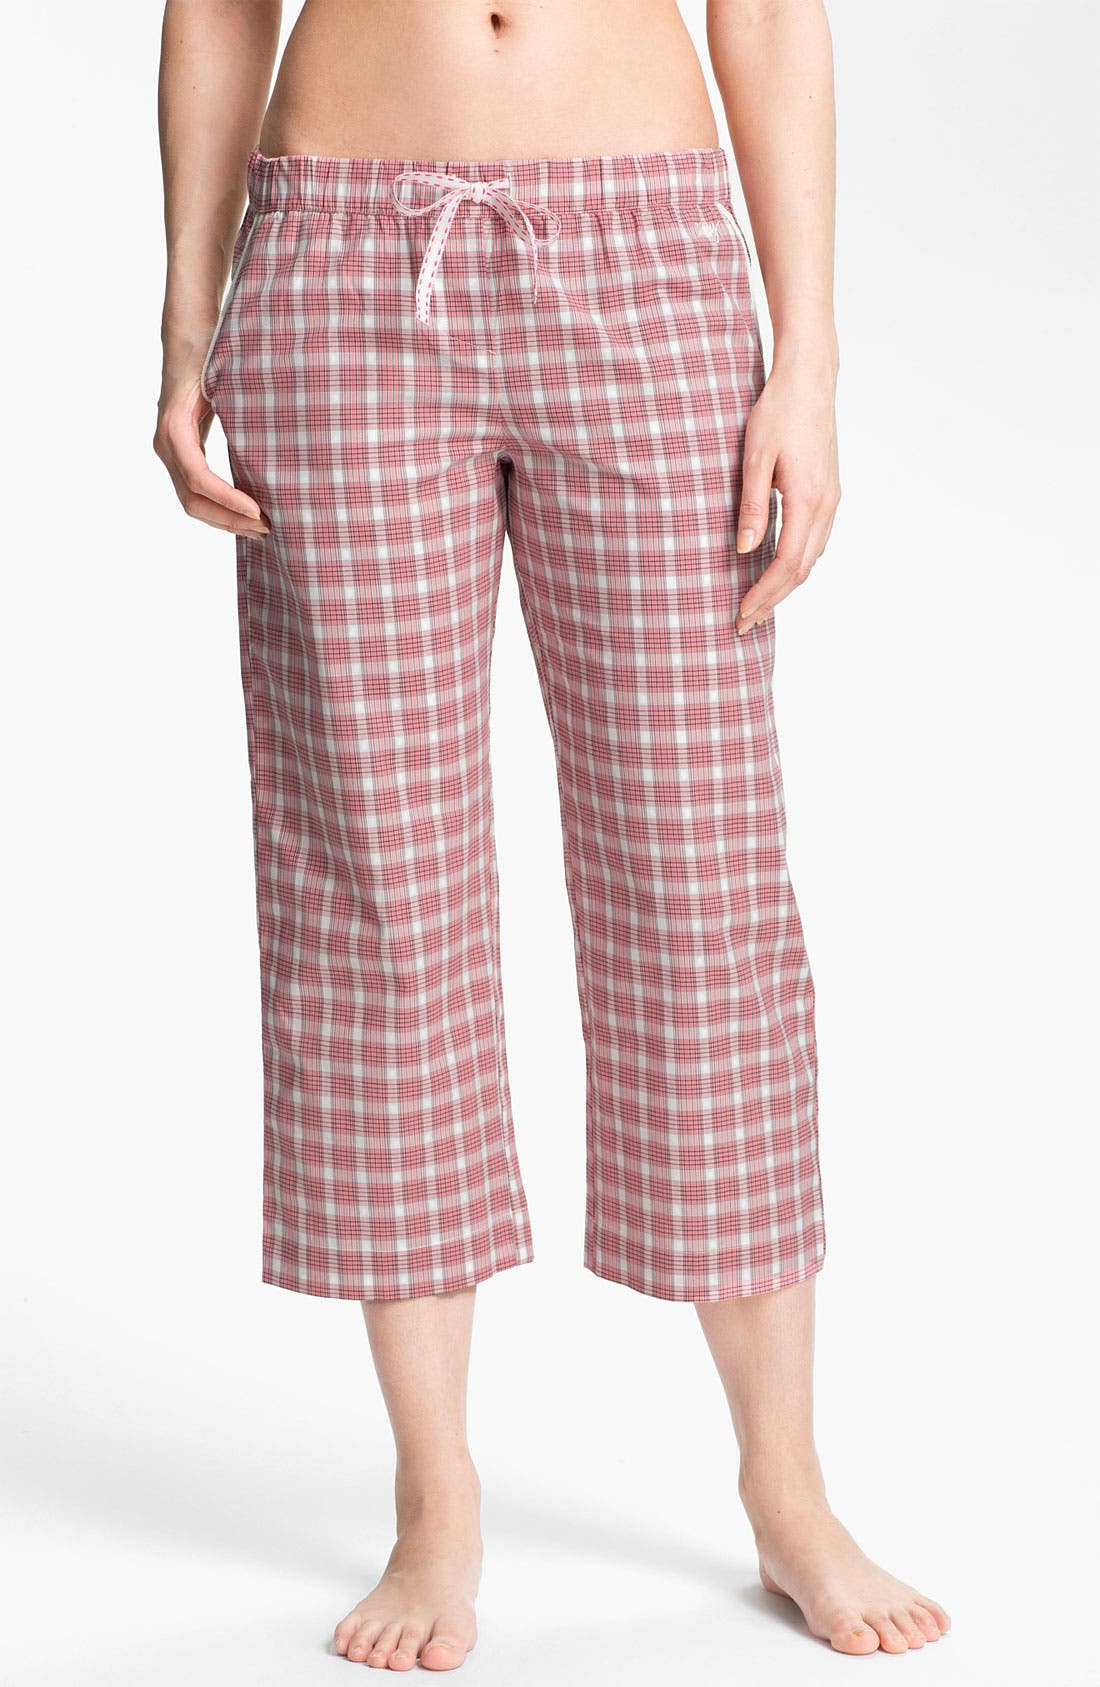 Alternate Image 1 Selected - DKNY 'Sugar Rush' Capri Pants